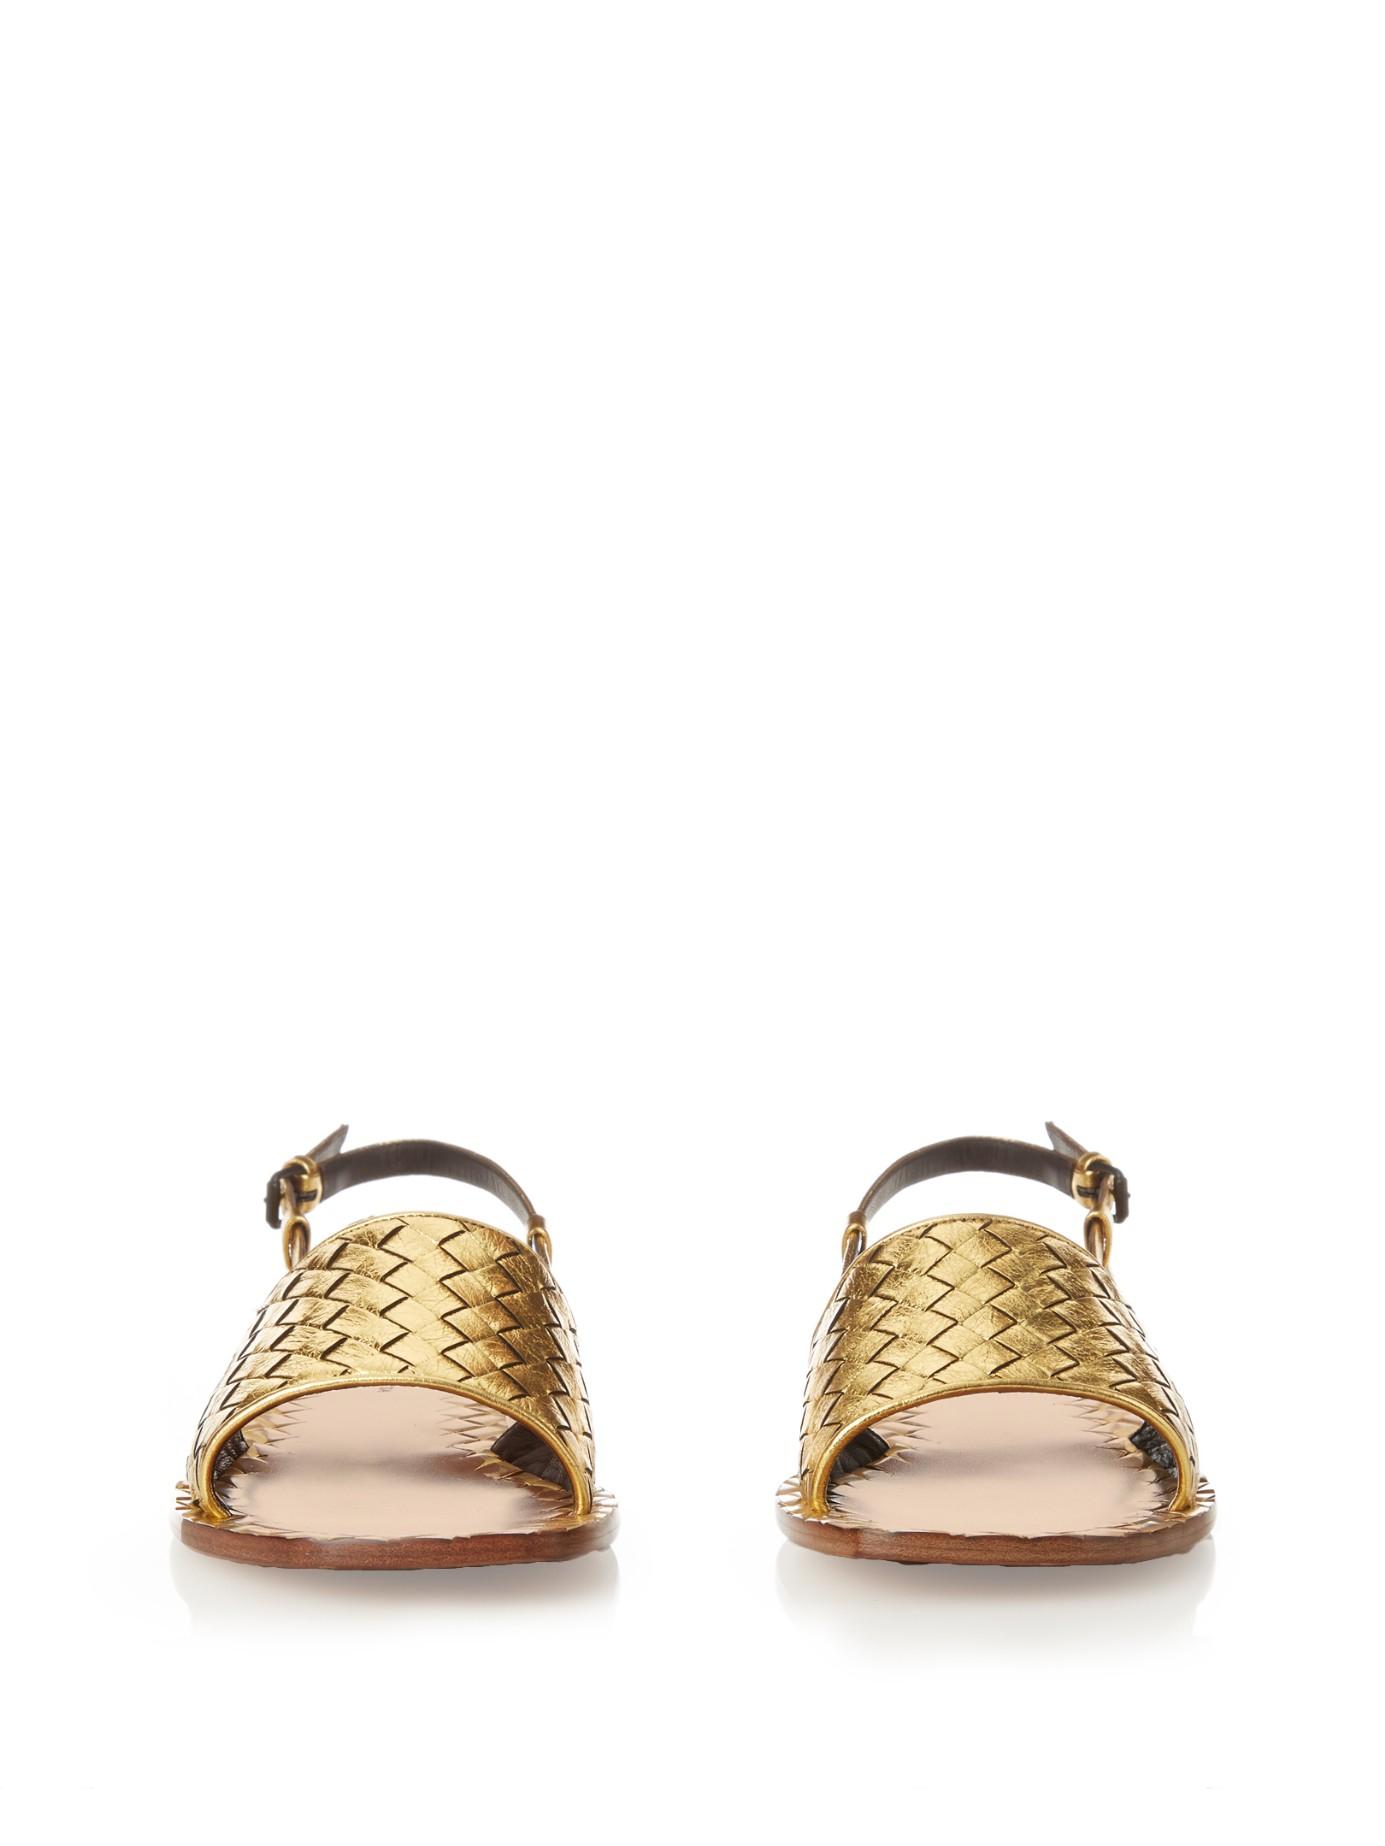 Bottega Veneta Intrecciato Leather Sandals outlet finishline 2014 newest cheap online buy cheap affordable get to buy online s8ebA1gM5